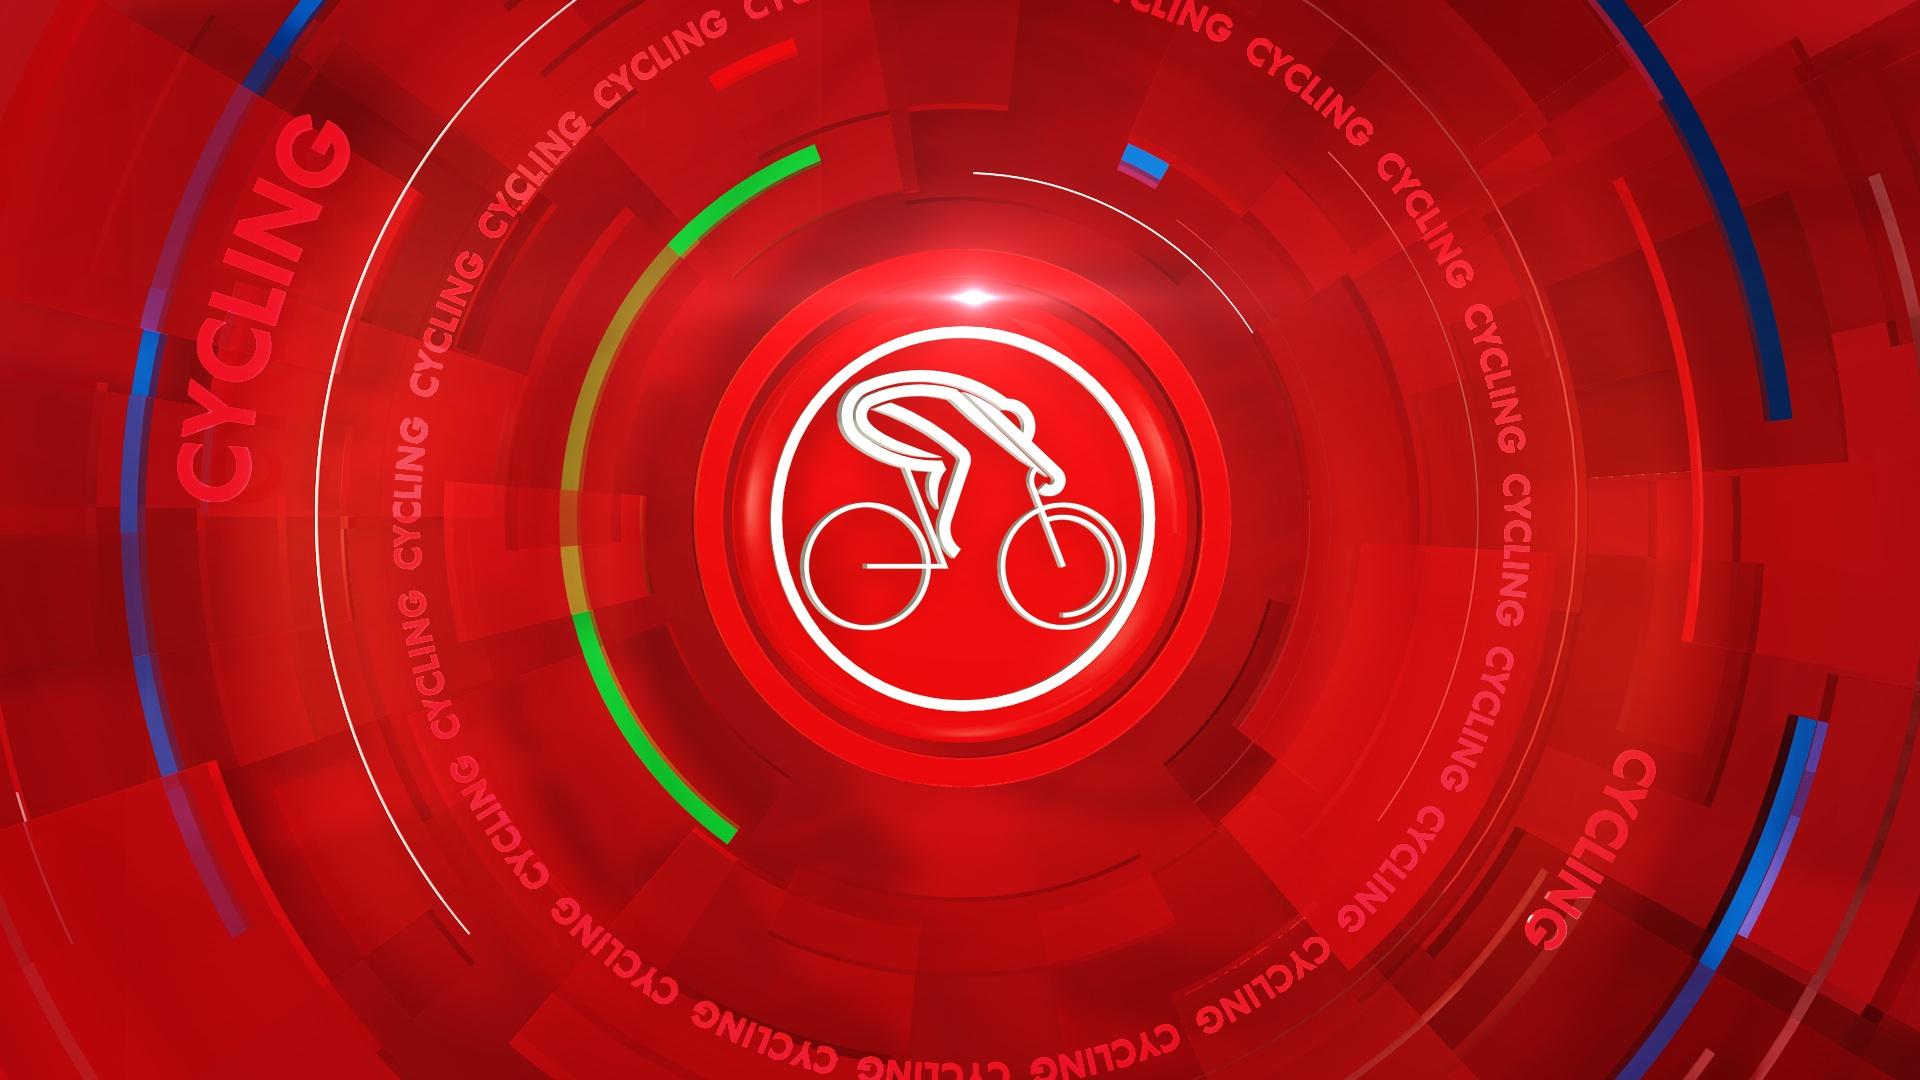 03F_CYCLING_STRANS_00038.jpeg